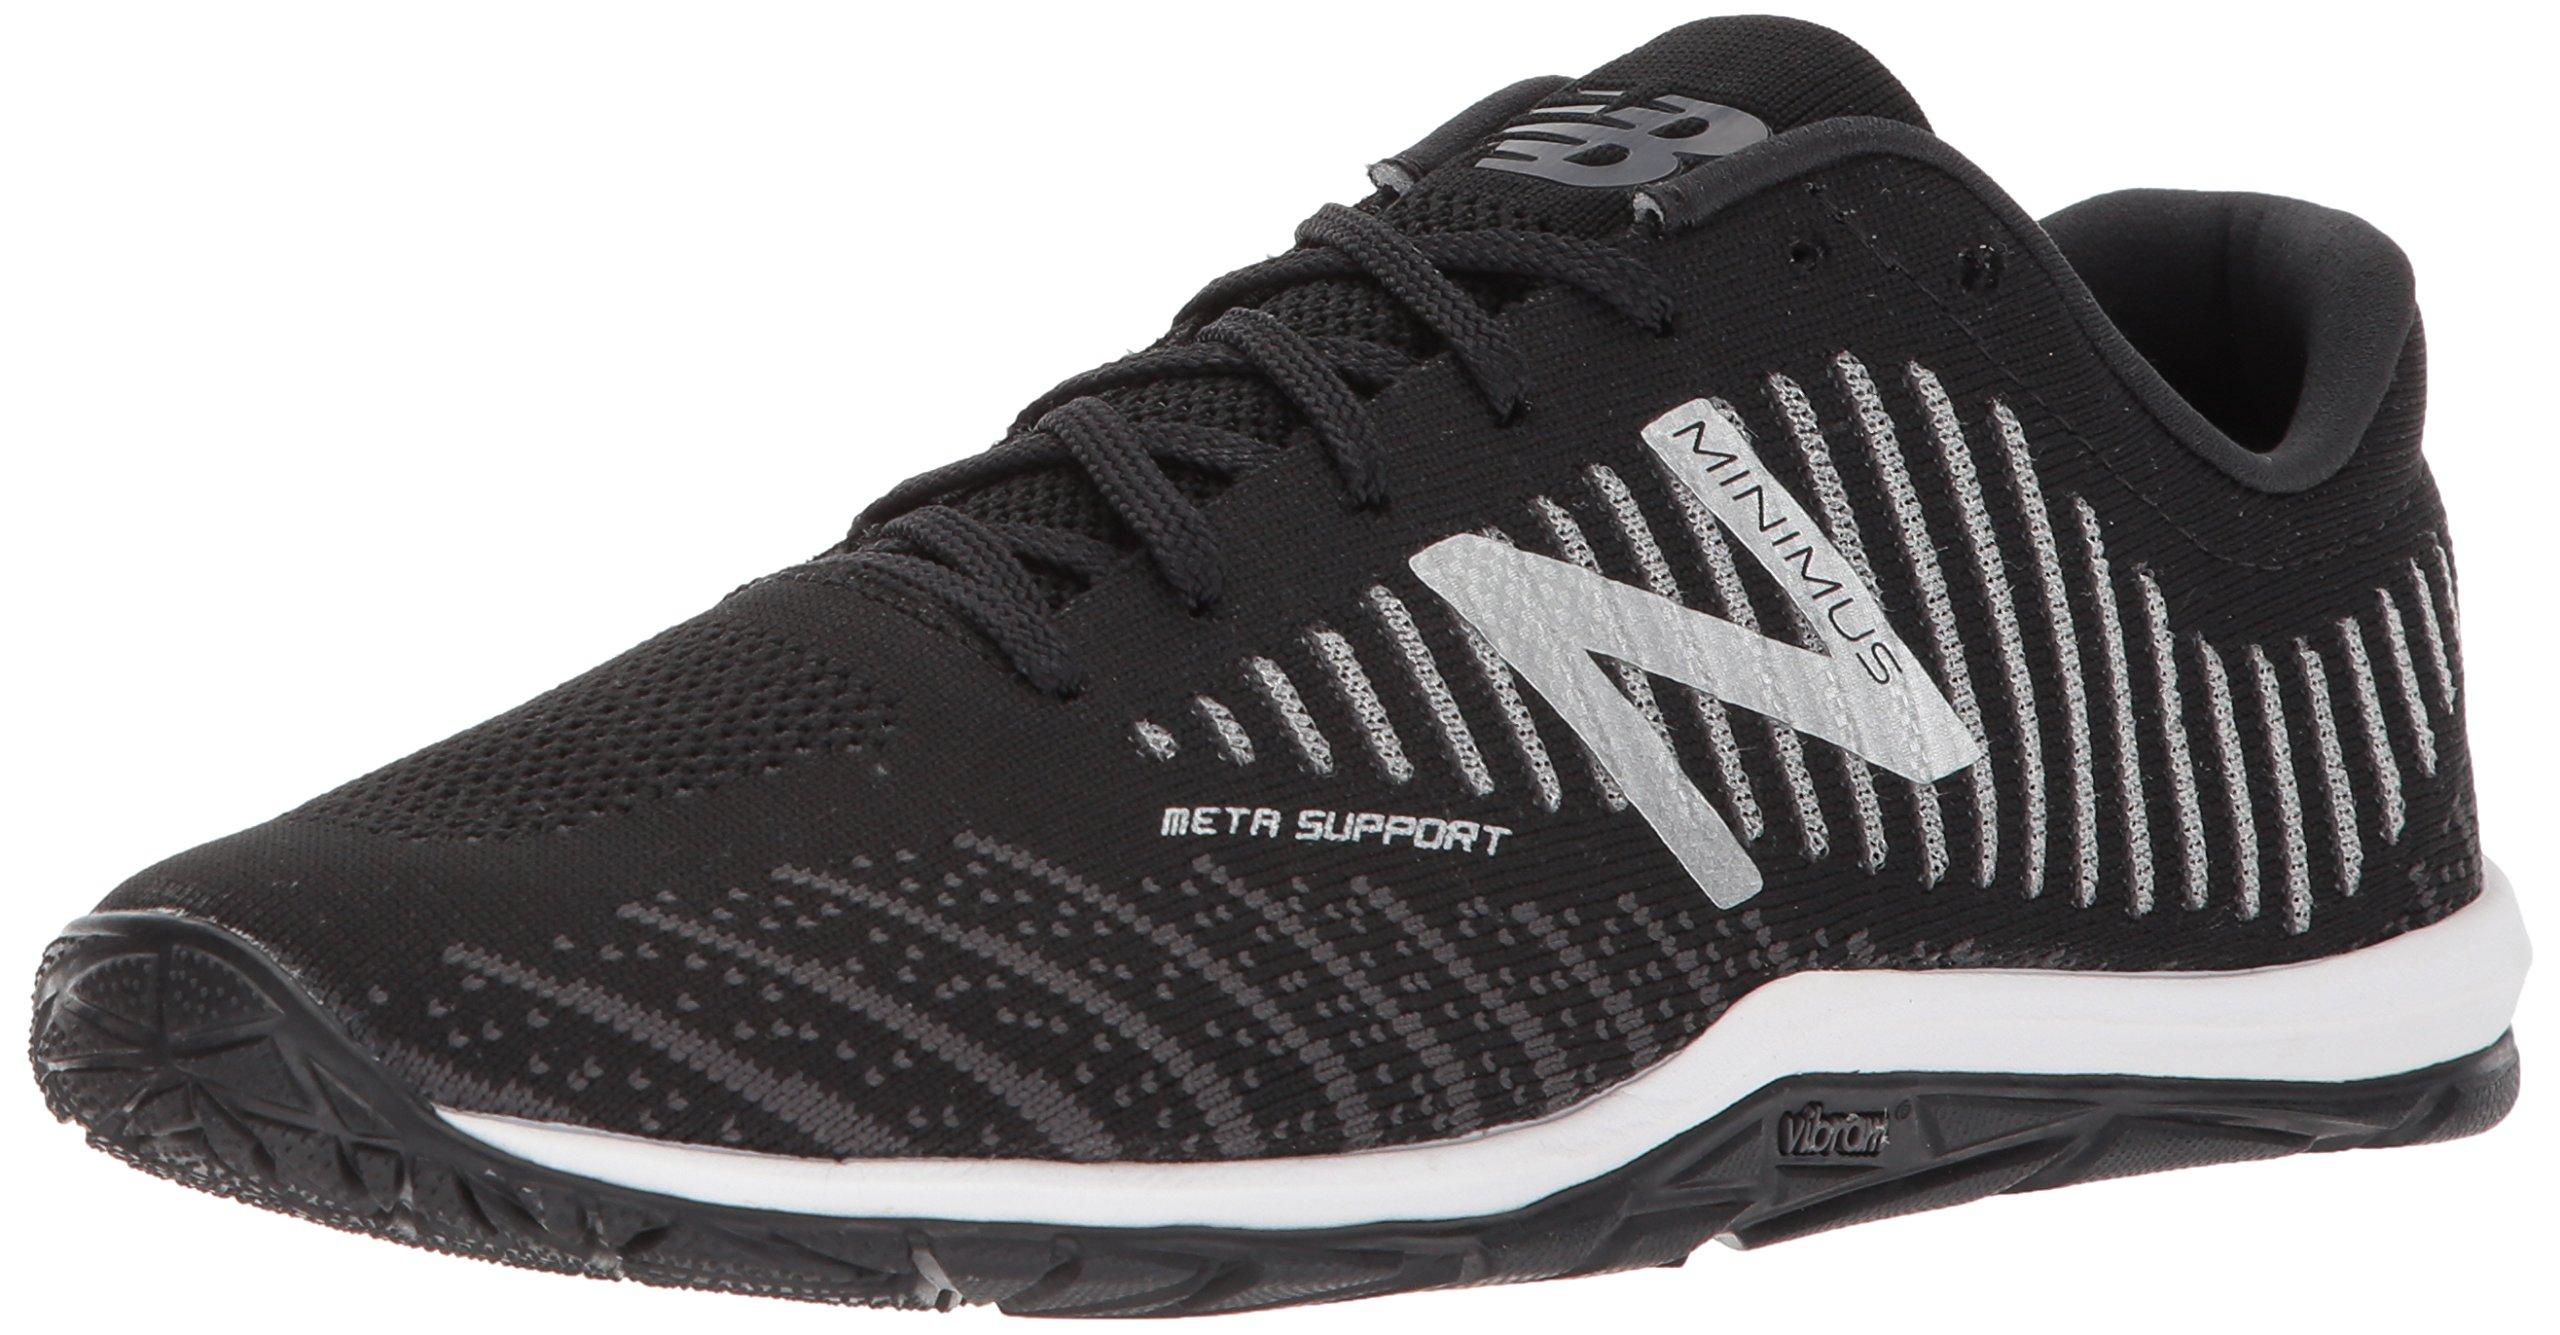 New Balance Men's 20v7 Minimus Training Shoe, Black/White, 10.5 D US by New Balance